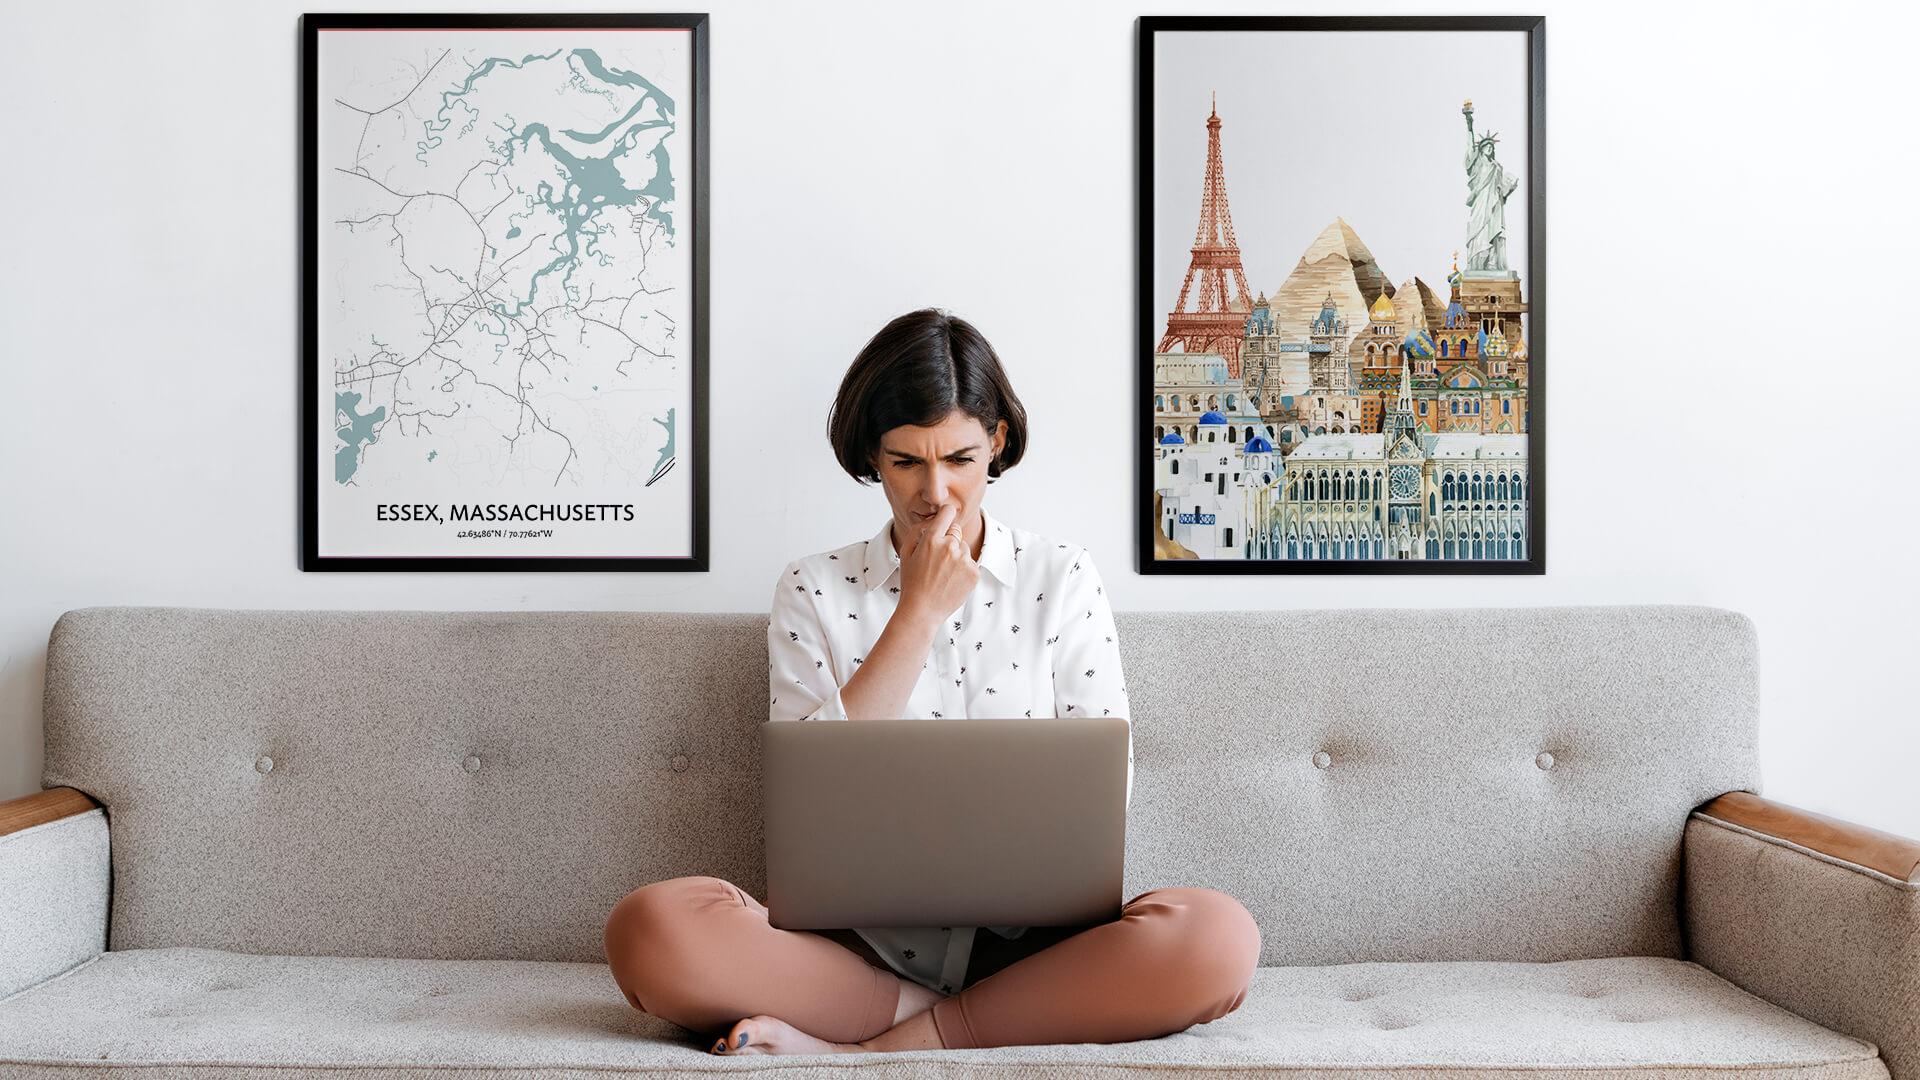 Essex city map art